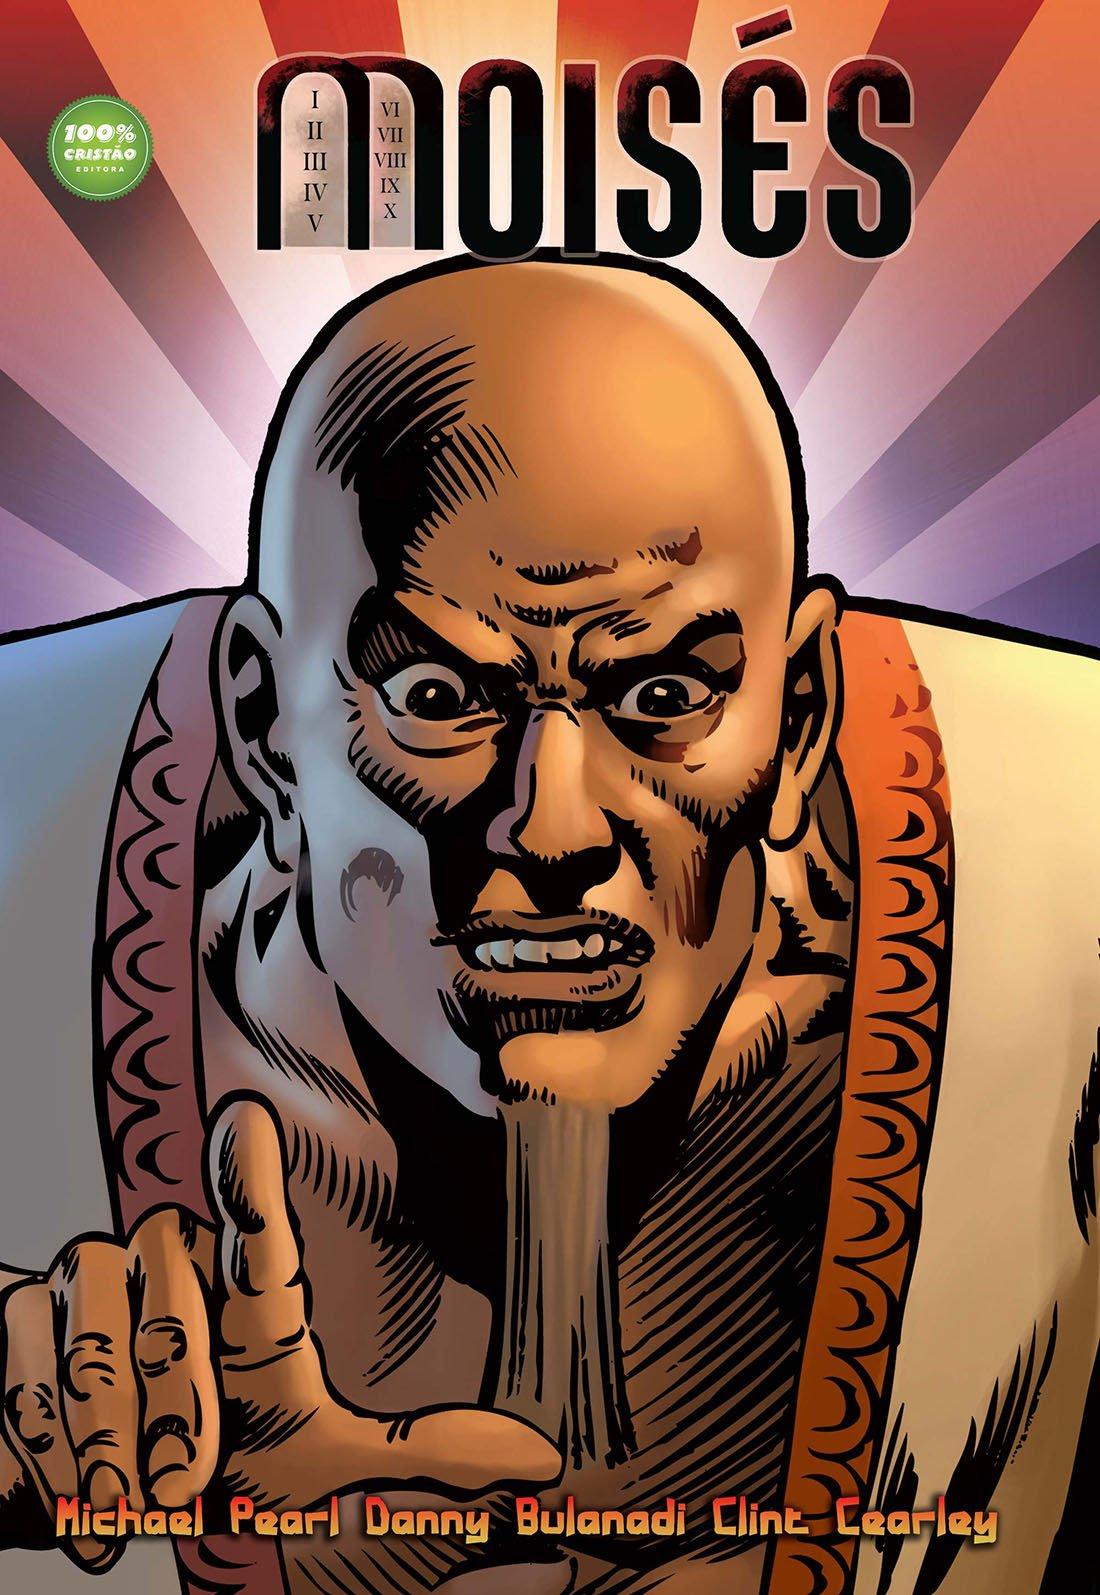 HQ Moisés - Michael Pearl - Revista Em Quadrinhos Cristã